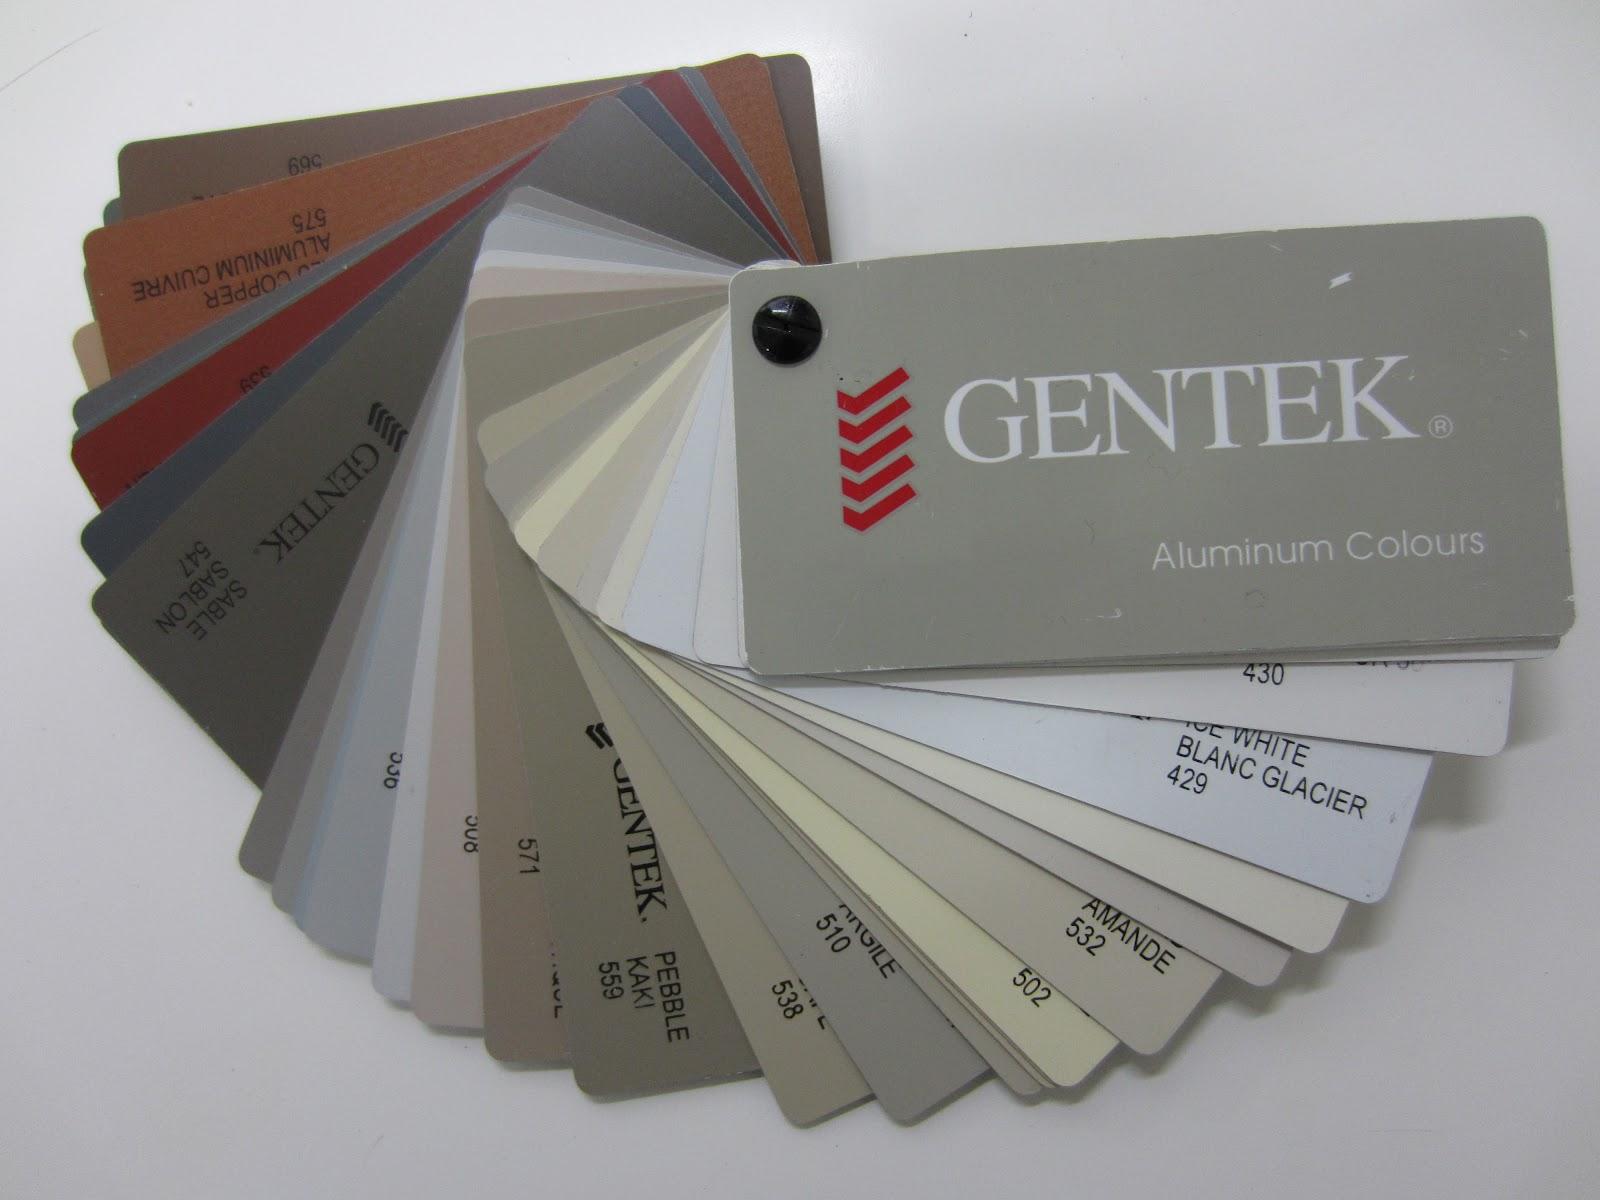 The eavestrough company eavestrough colours for Fenetre alu couleur